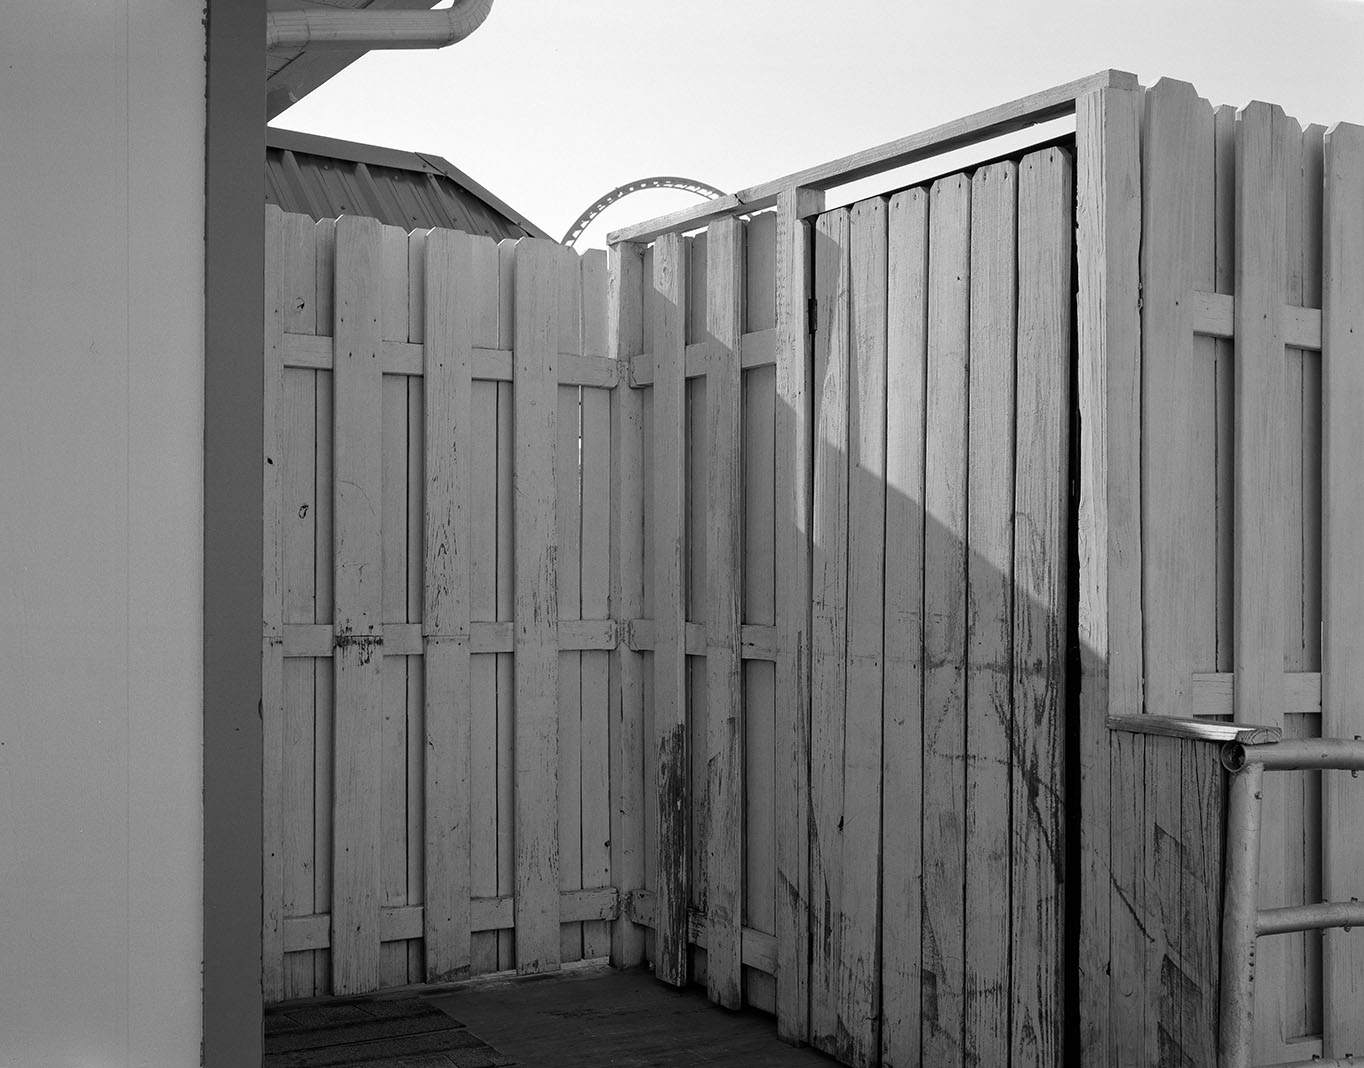 fence_edits.jpg